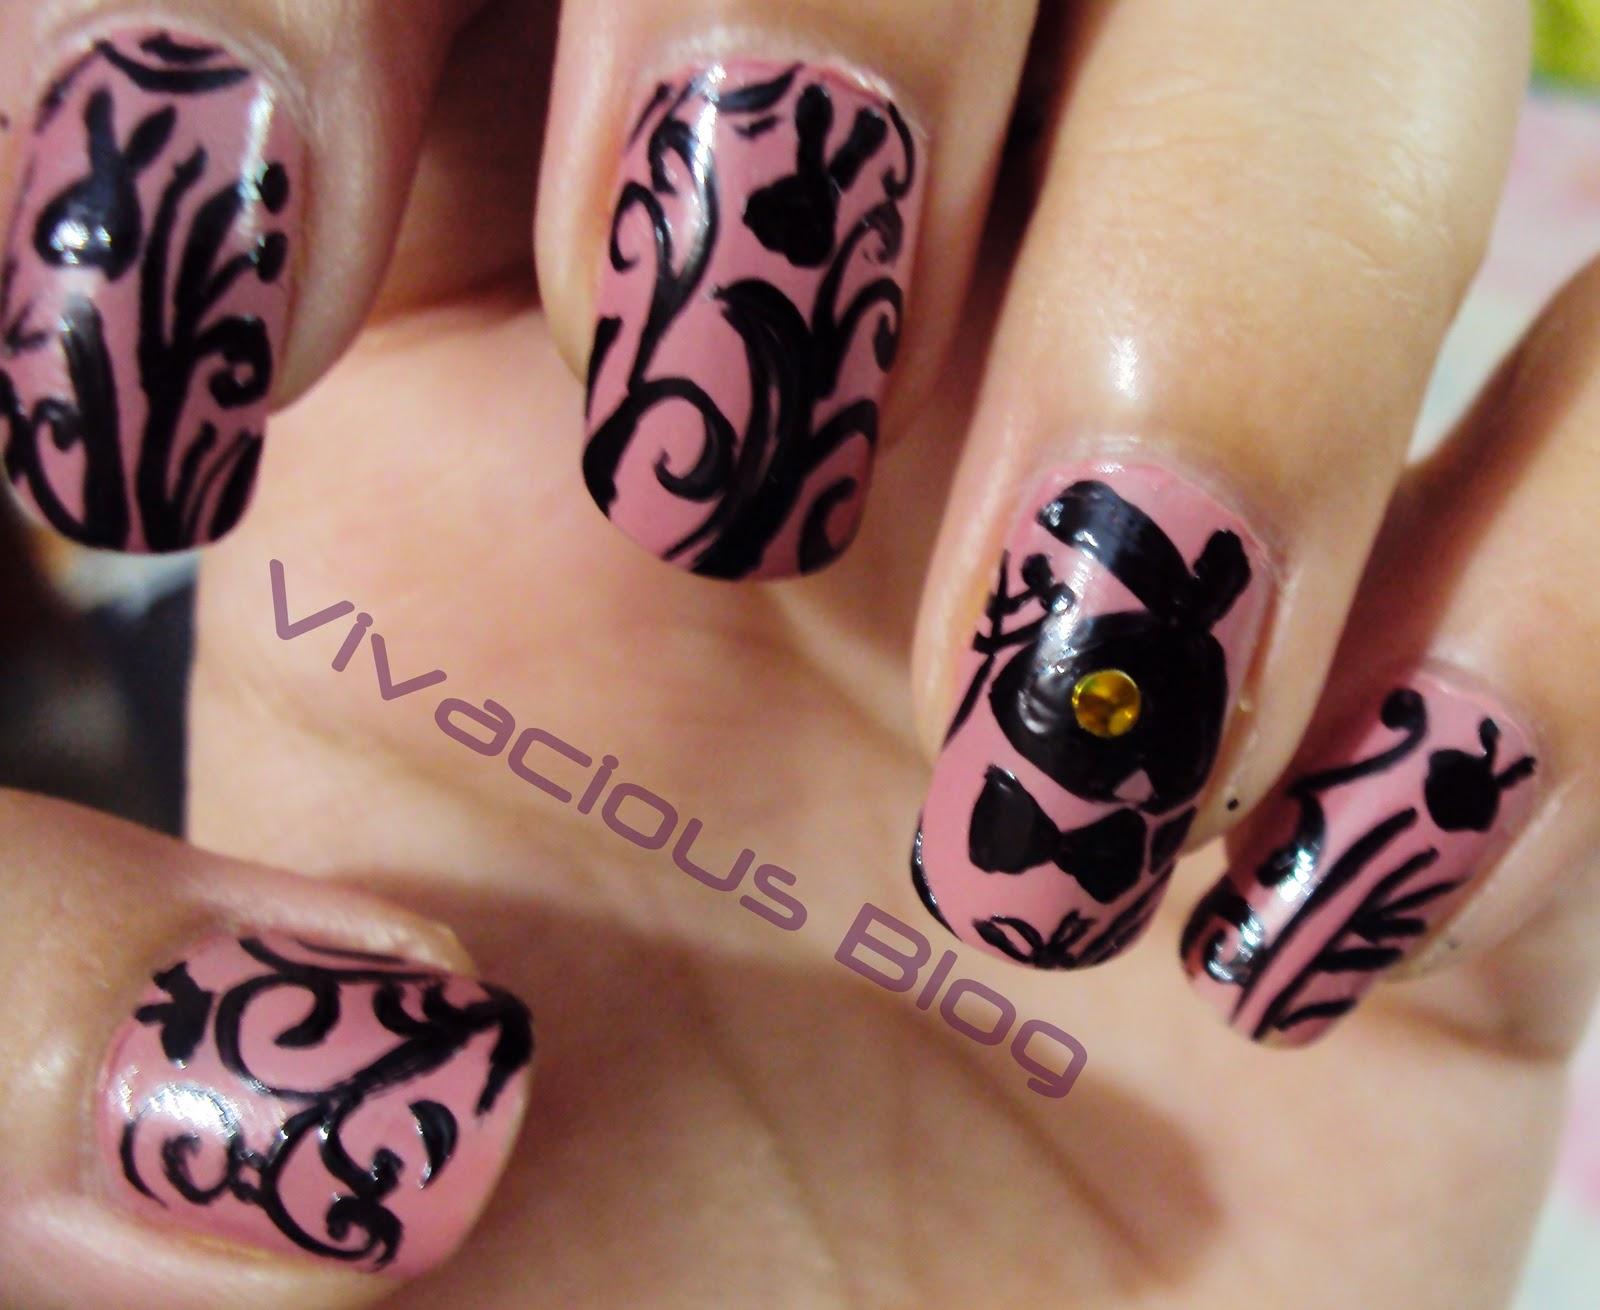 Vivacious Blog: Playboy Bunny Inspired Nail Art